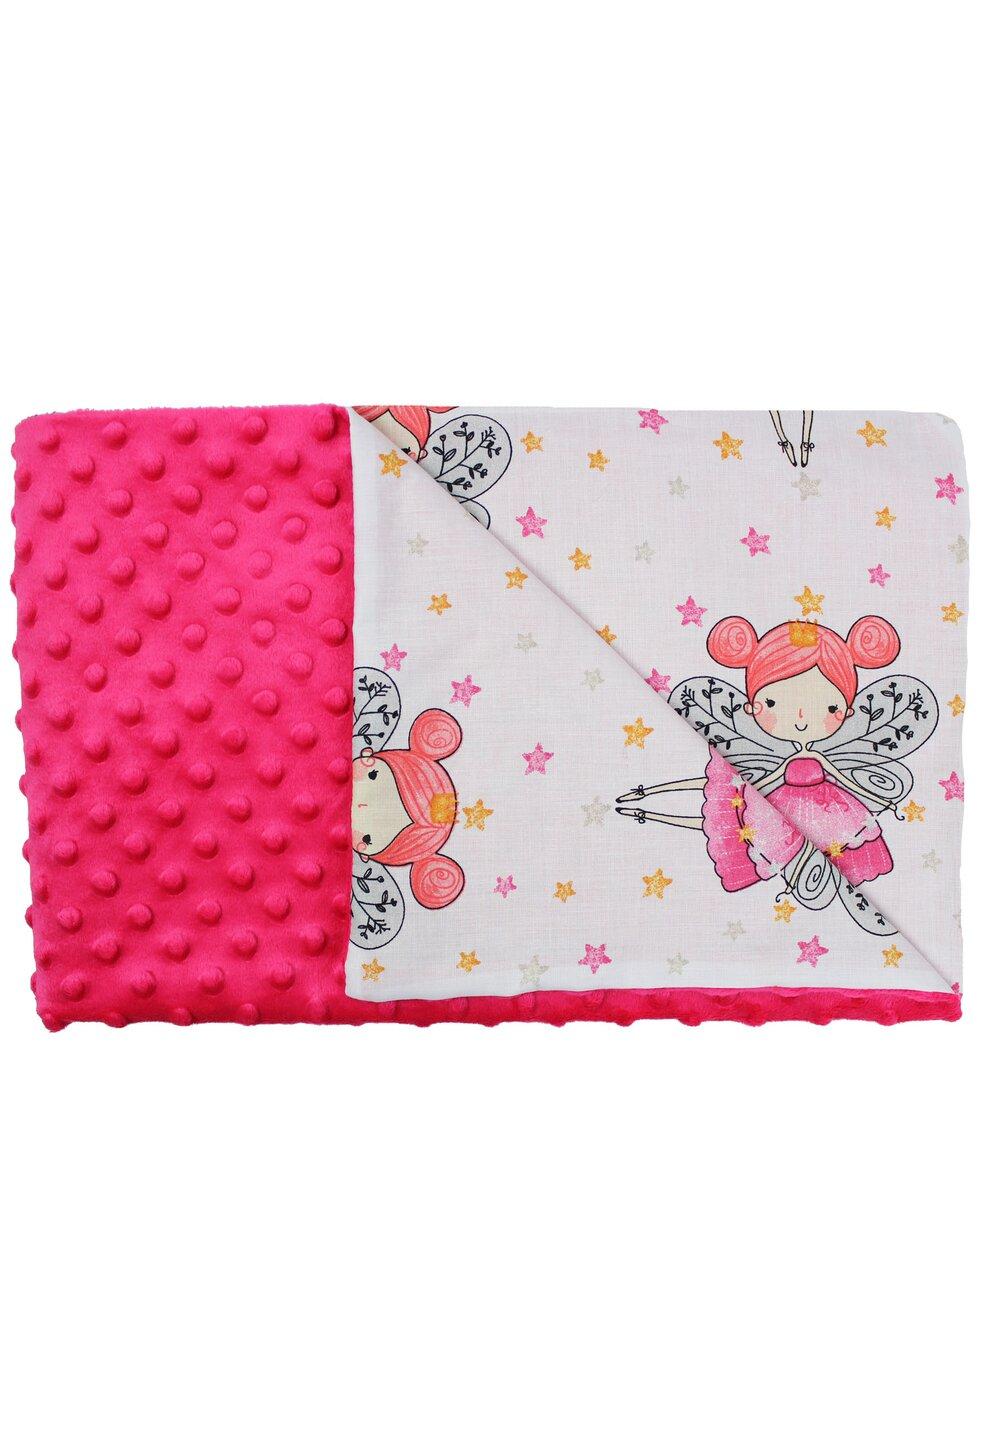 Paturica 2 fete, Minky roz, Printesa fluture, 80x100cm imagine